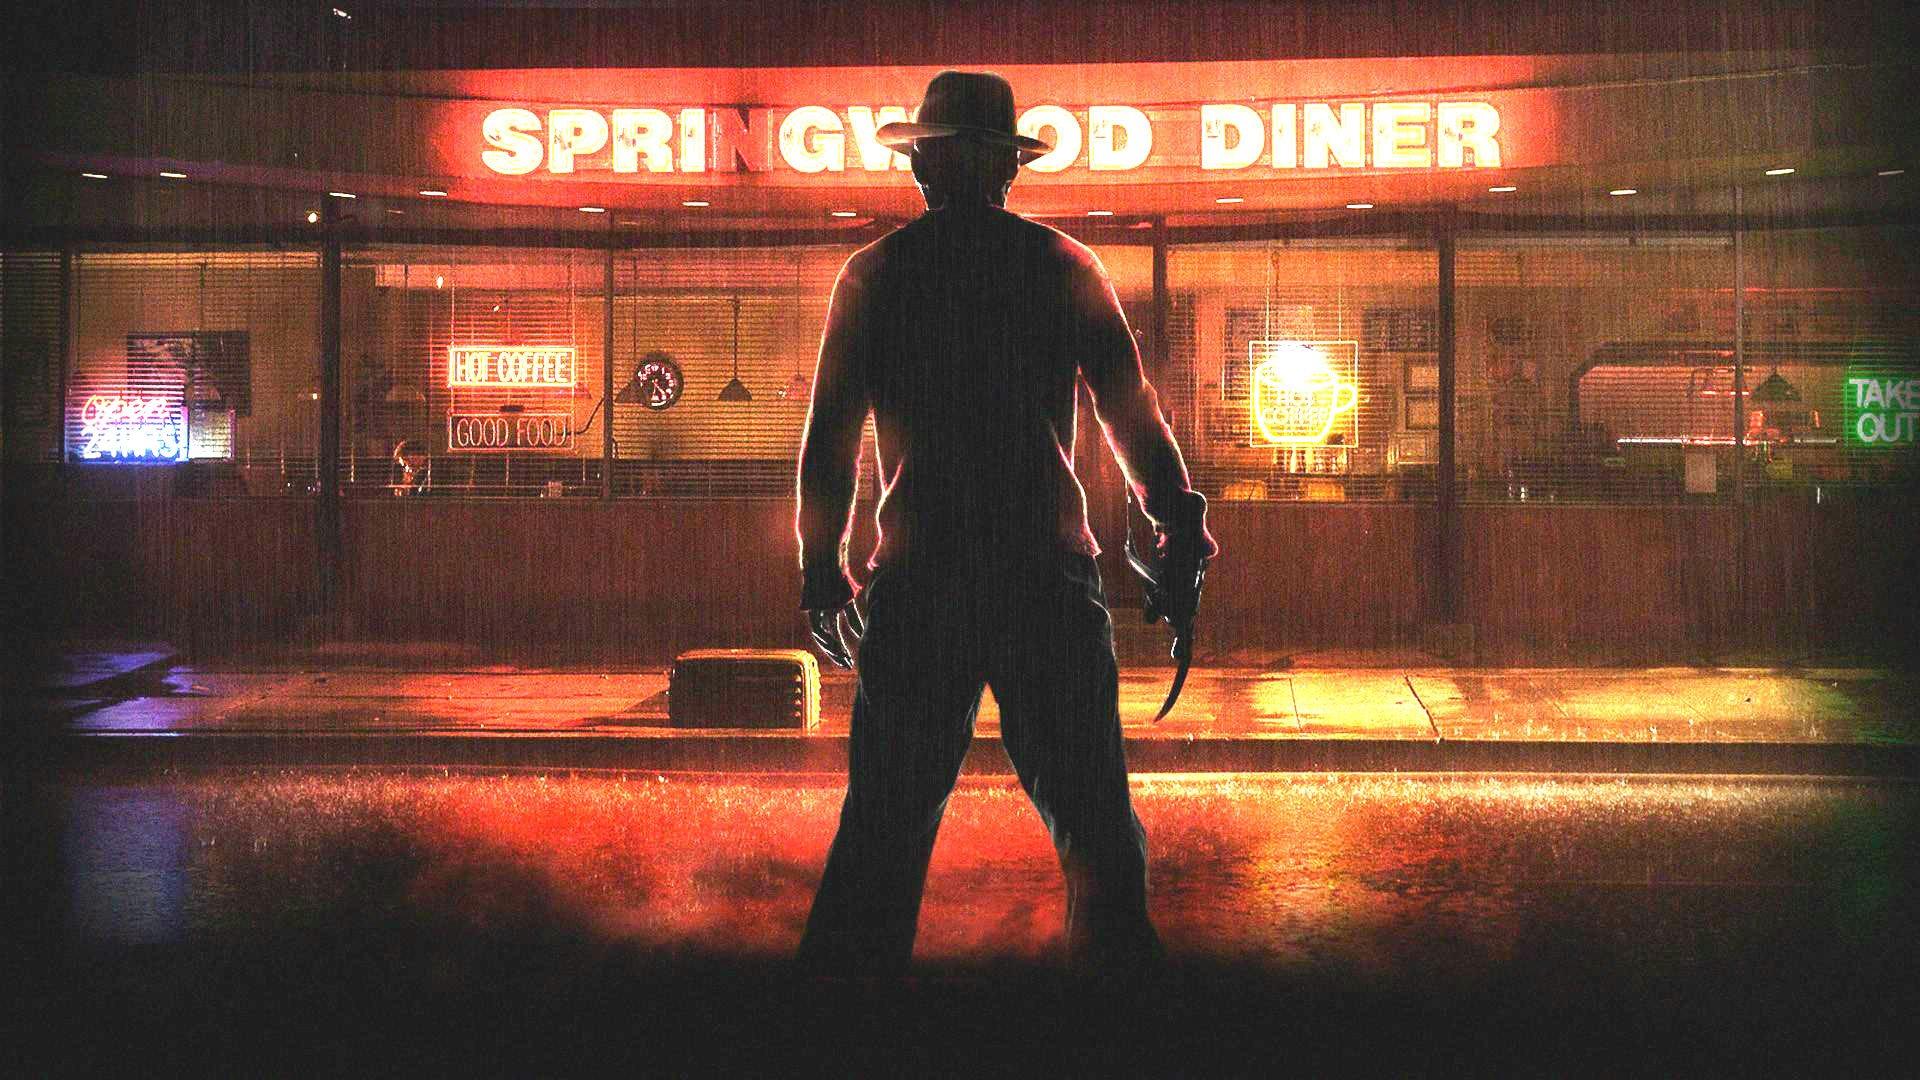 A NIGHTMARE ON ELM STREET Dark Horror Thriller Rj Wallpaper